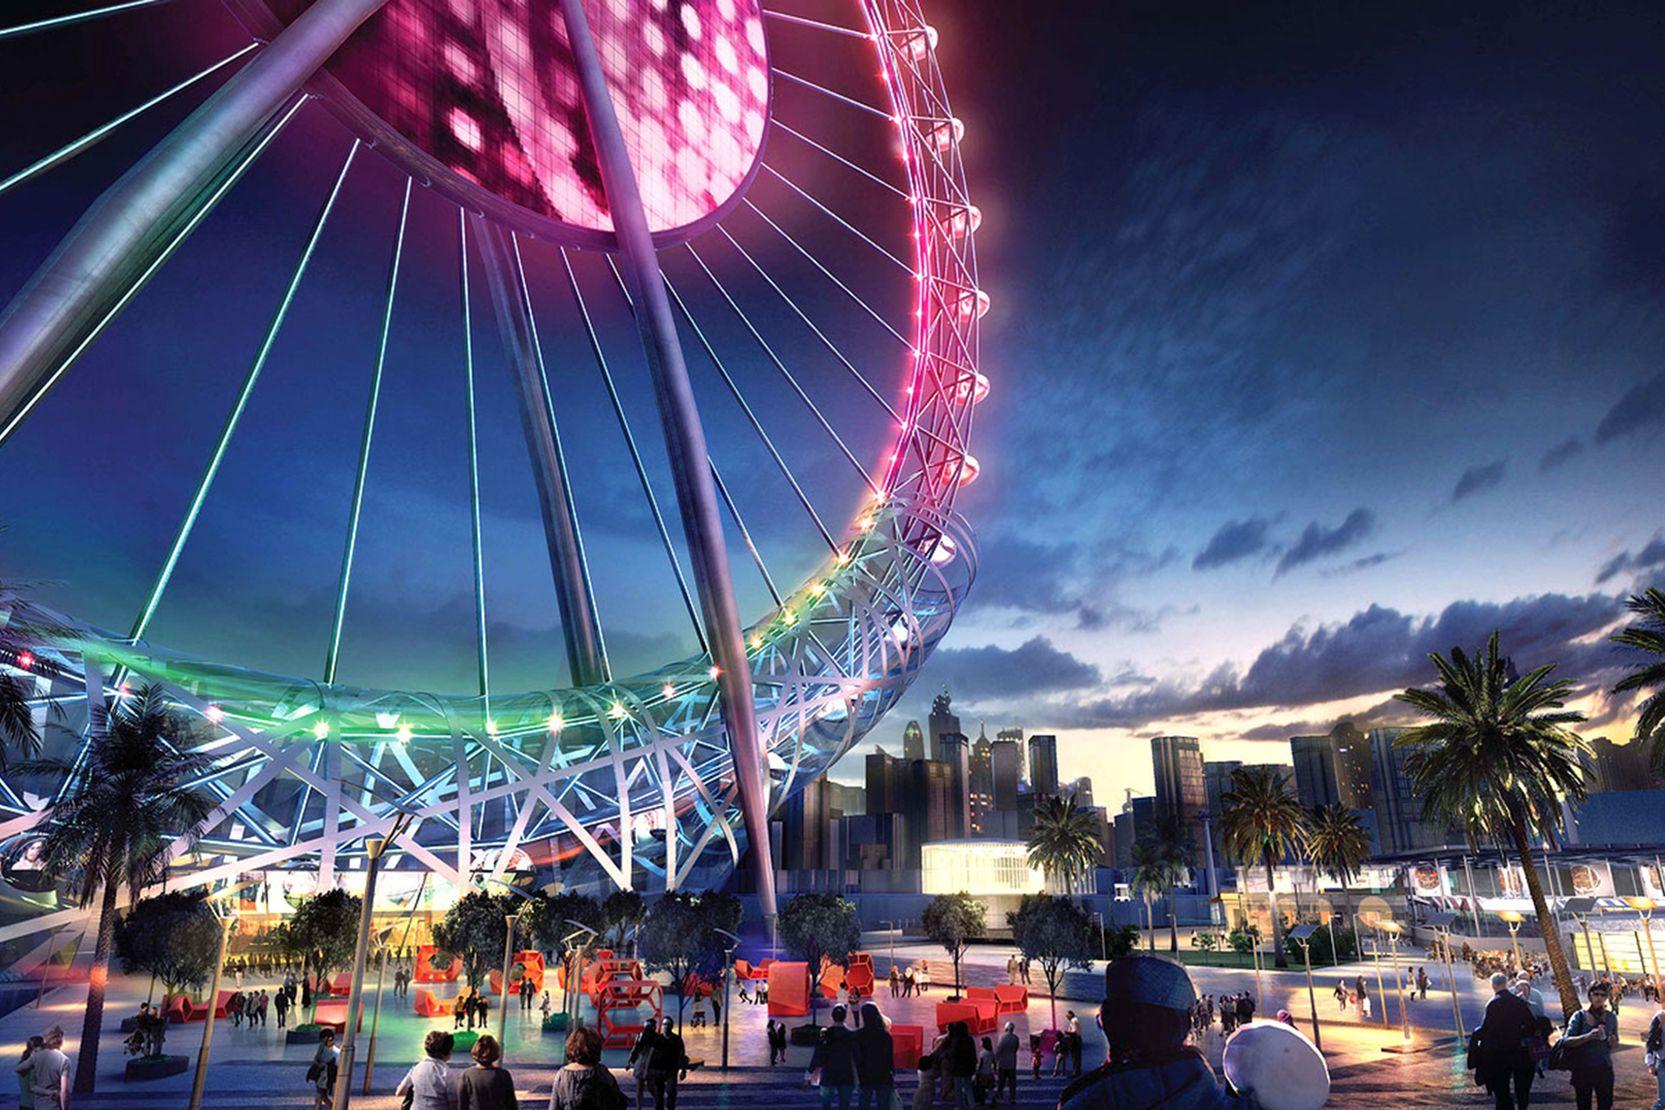 Dubai Eye Ferris Wheel, Dubai